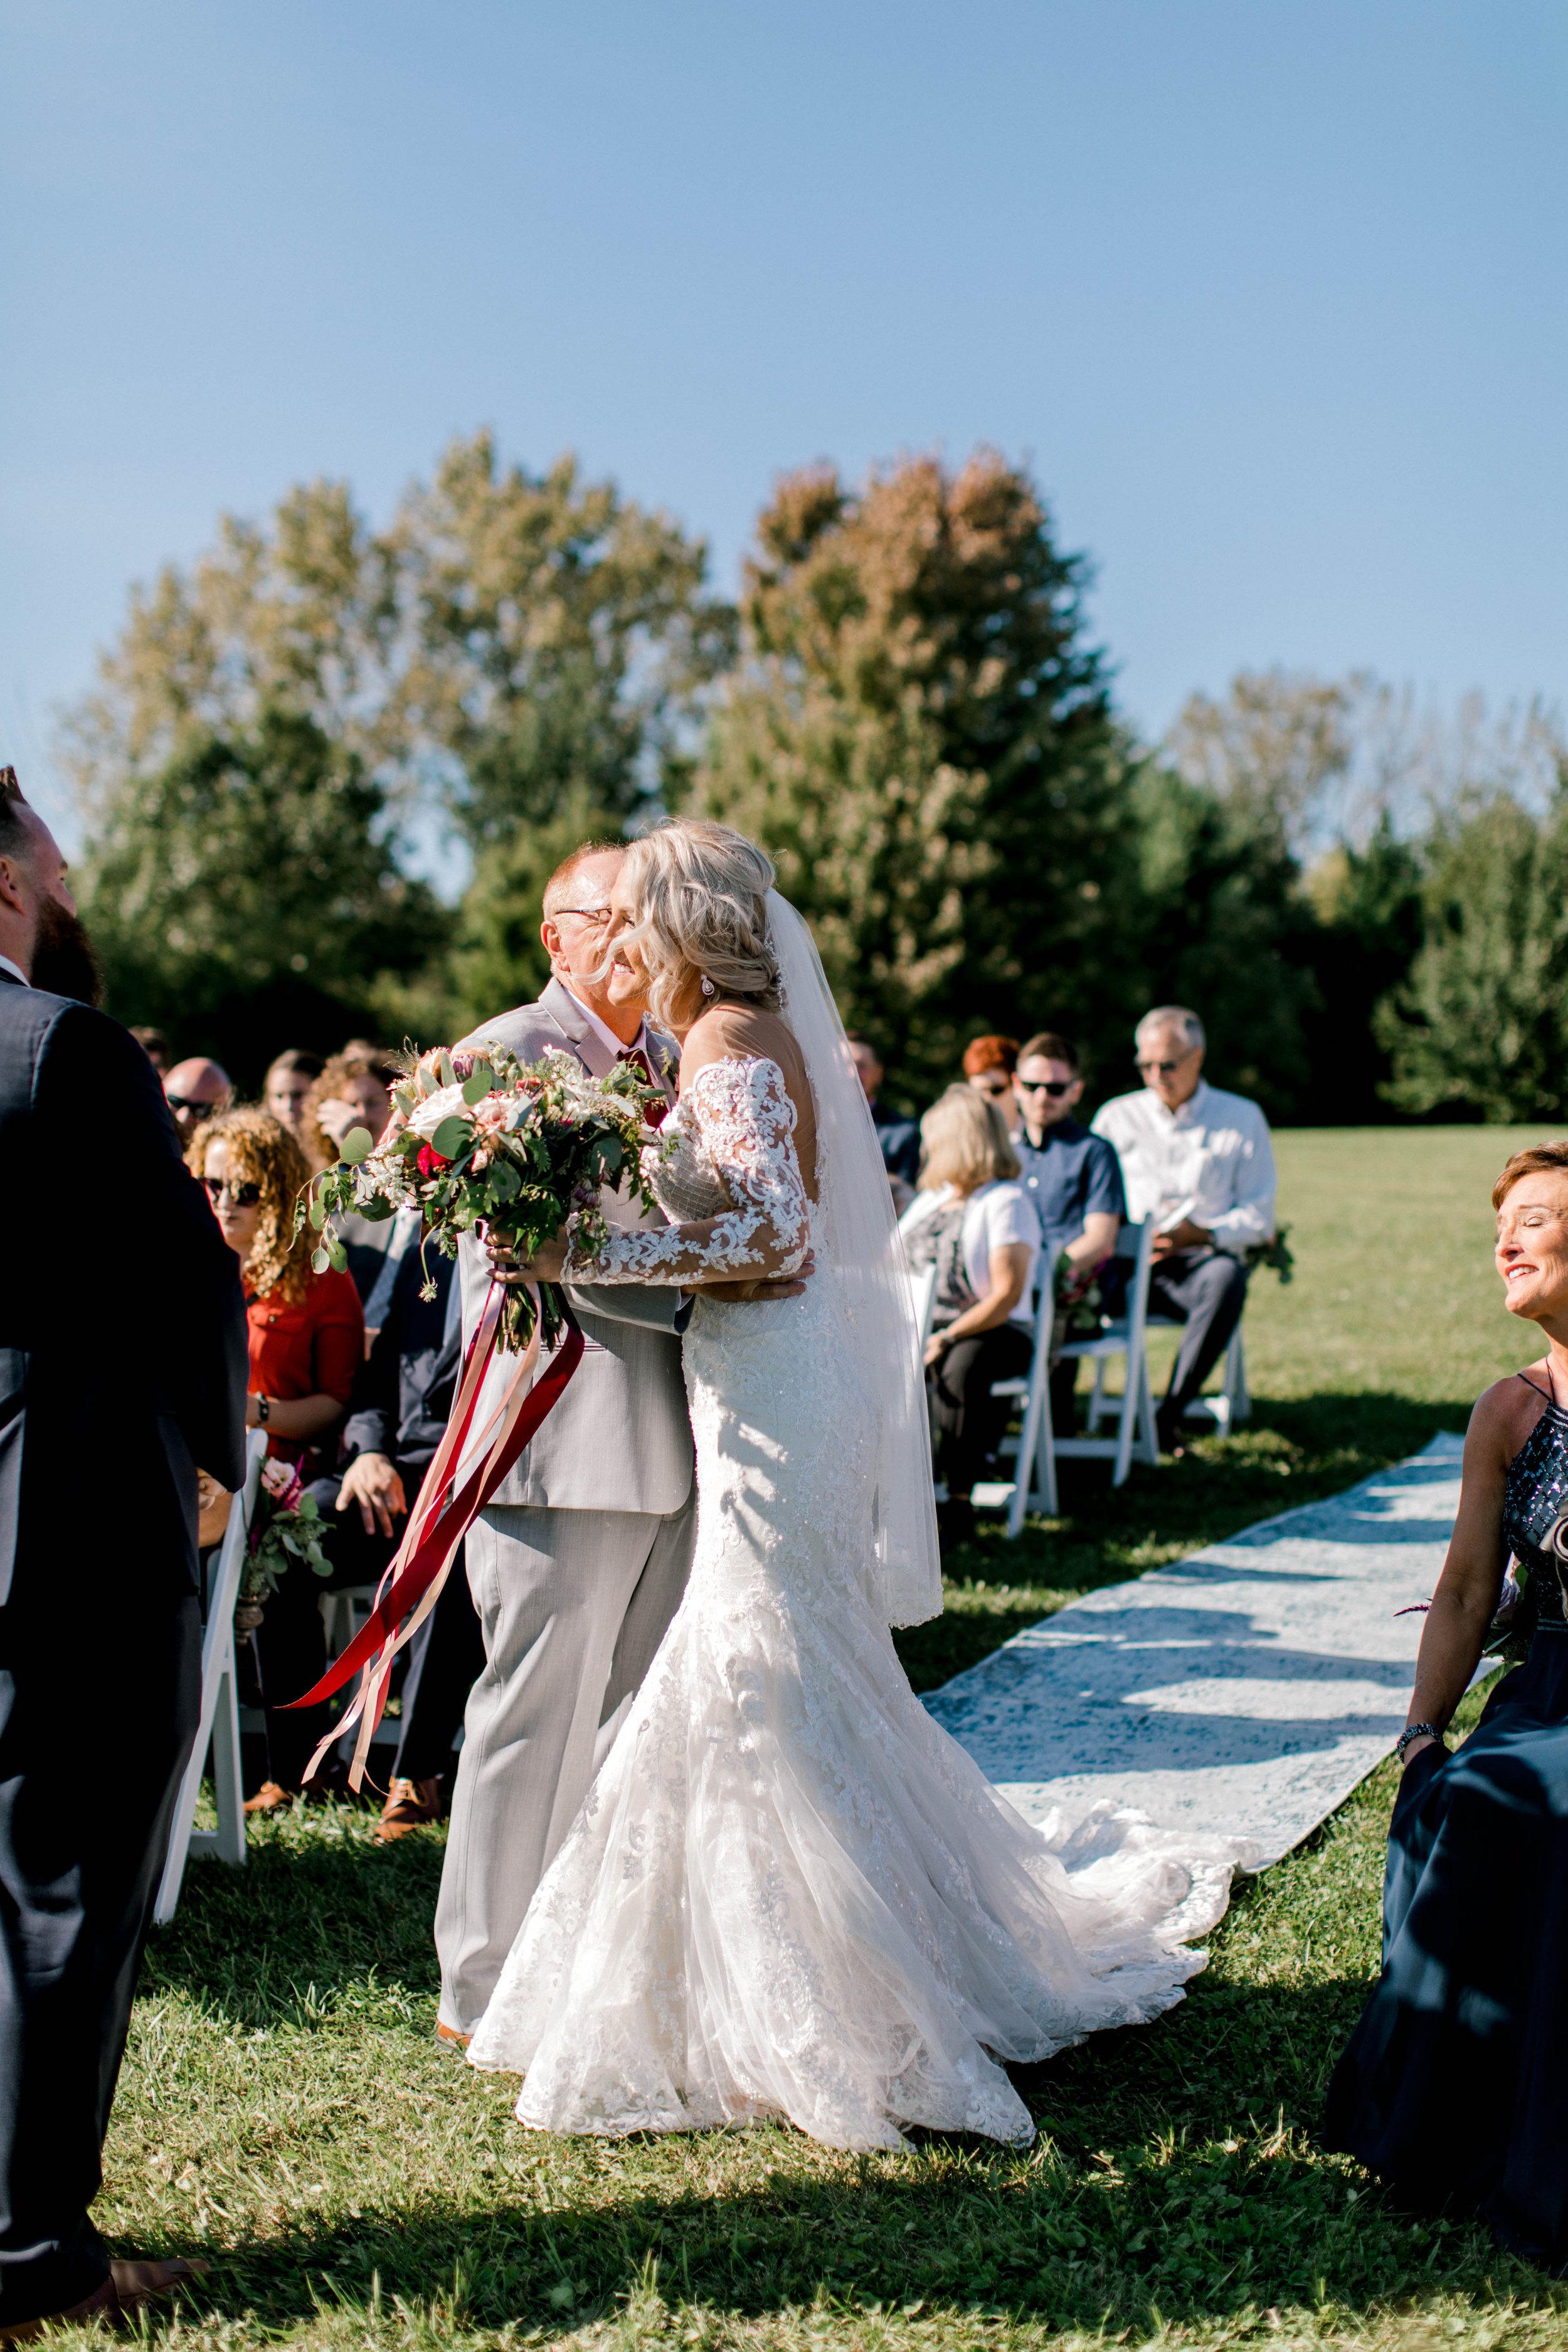 Ryan Alexa Married-Formals Ceremony-0154.jpg